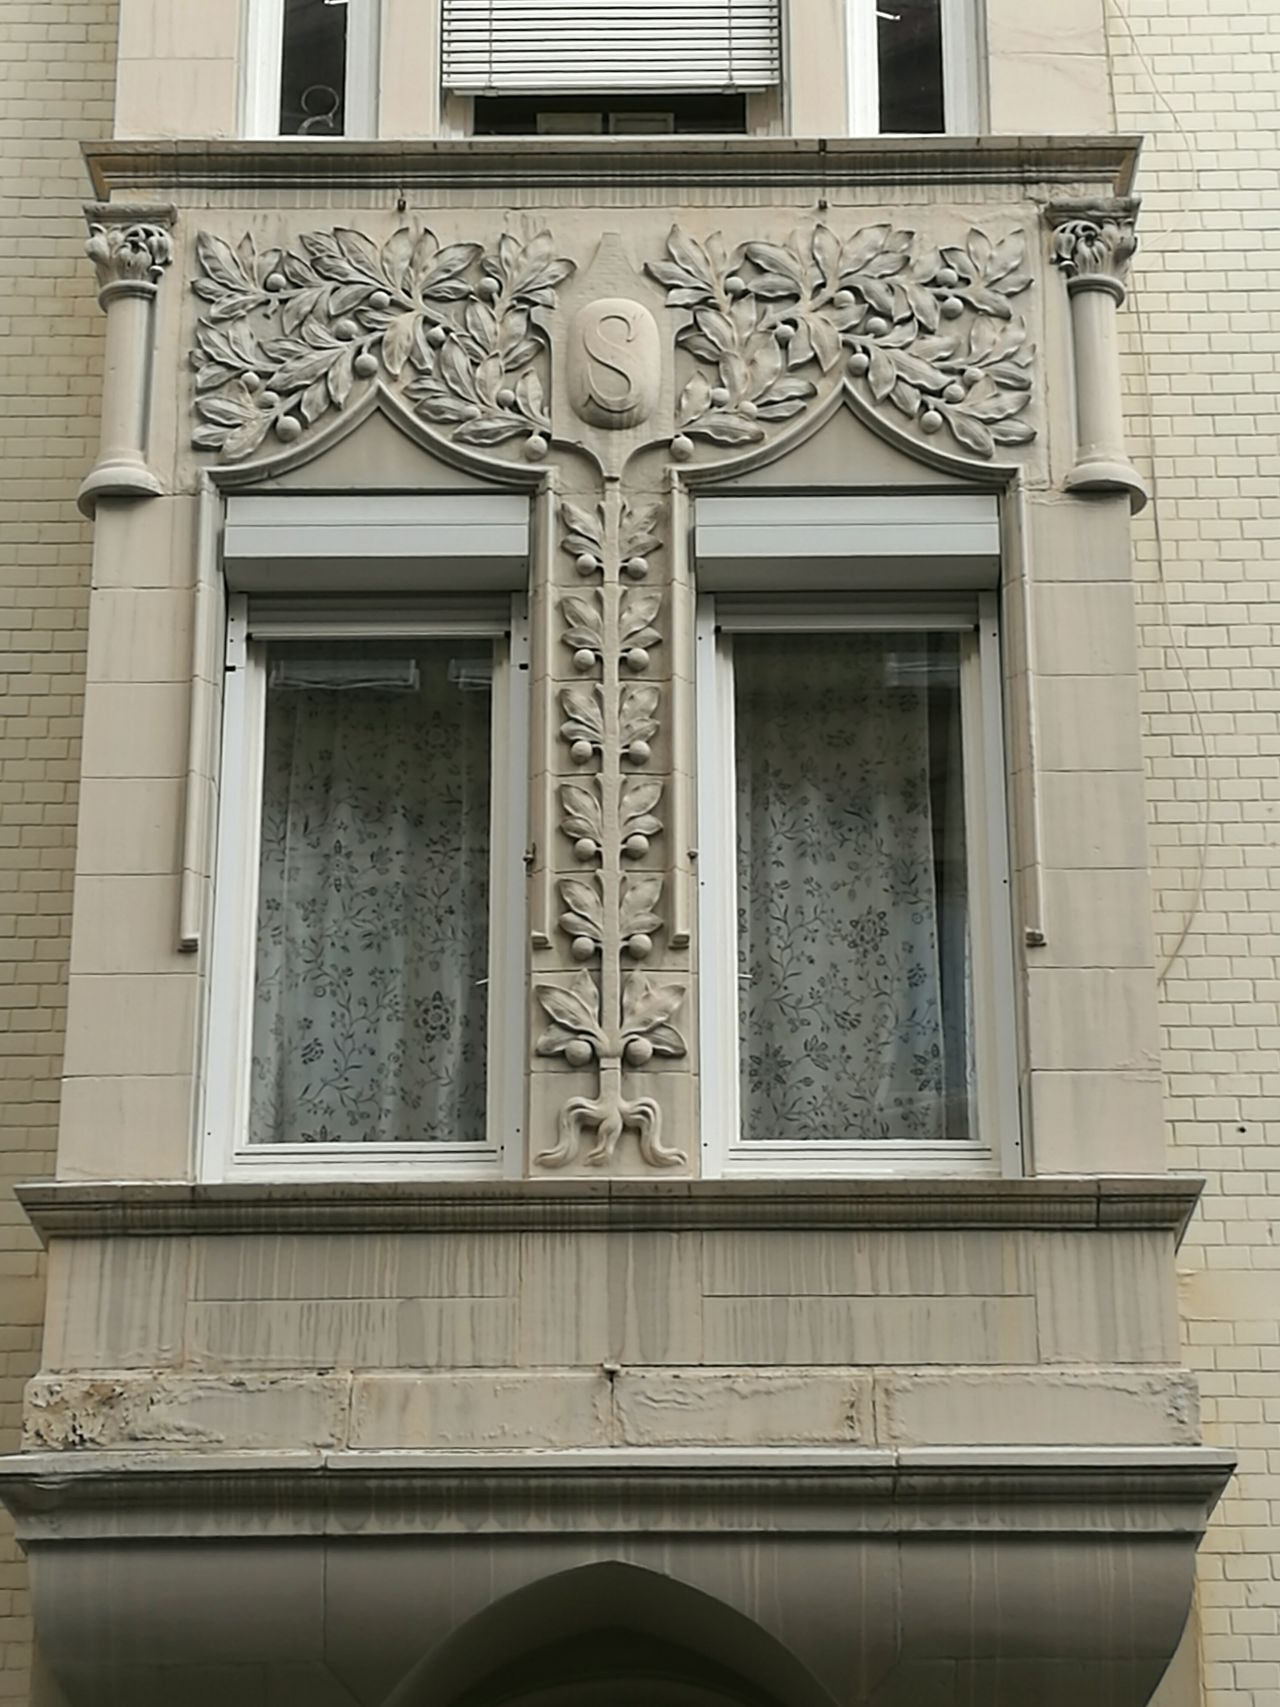 Detail of an Art nouveau house in Stuttgart. Building Exterior Architecture Ornate Balcony Historic Arch Architectural Detail Stuttgart The Past Architecture_collection Art Nouveau Architecture Art Nouveau Buildings Art Nouveau Style